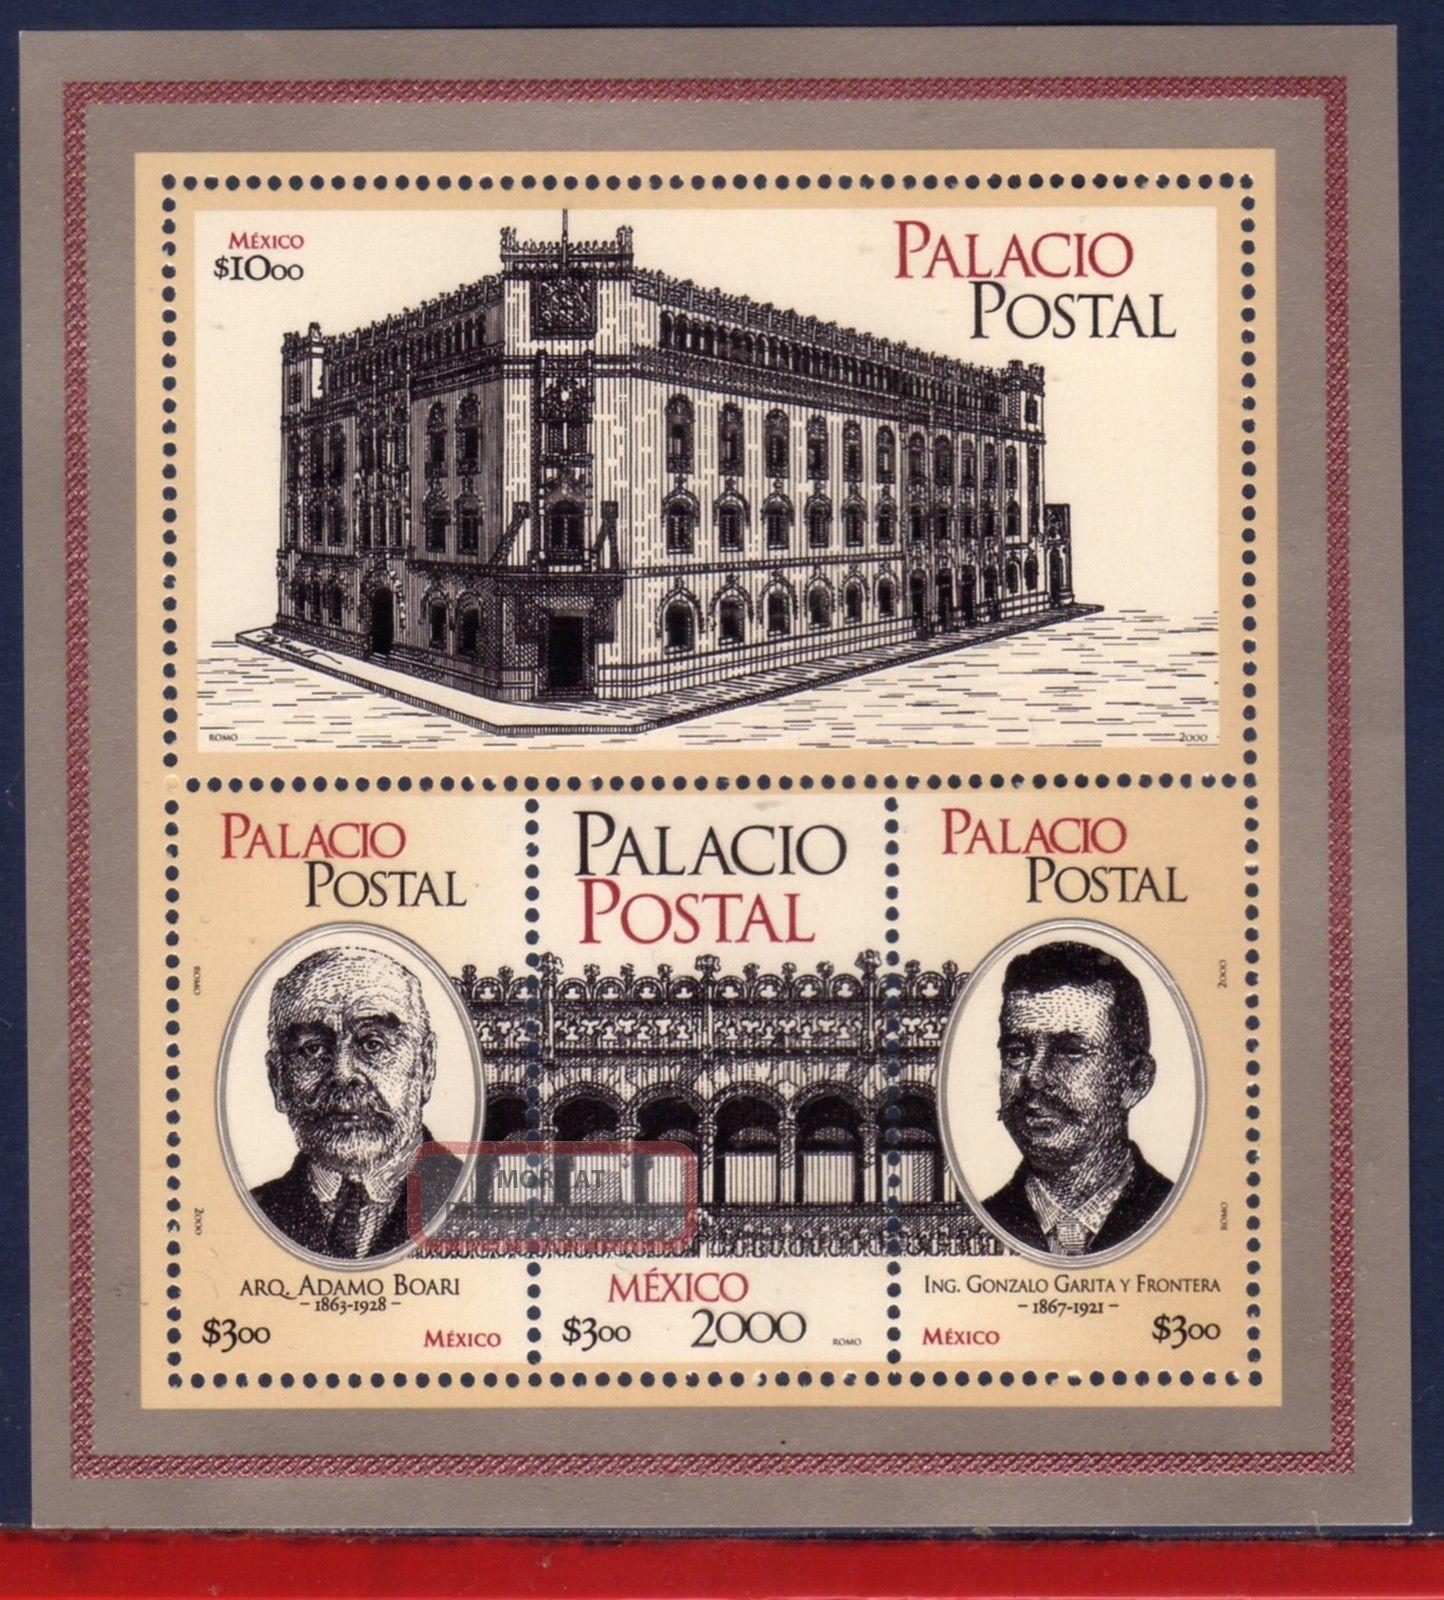 2219 - Mexico 2000 - Postal Palace,  Post,  Mi B57,  S/s Latin America photo